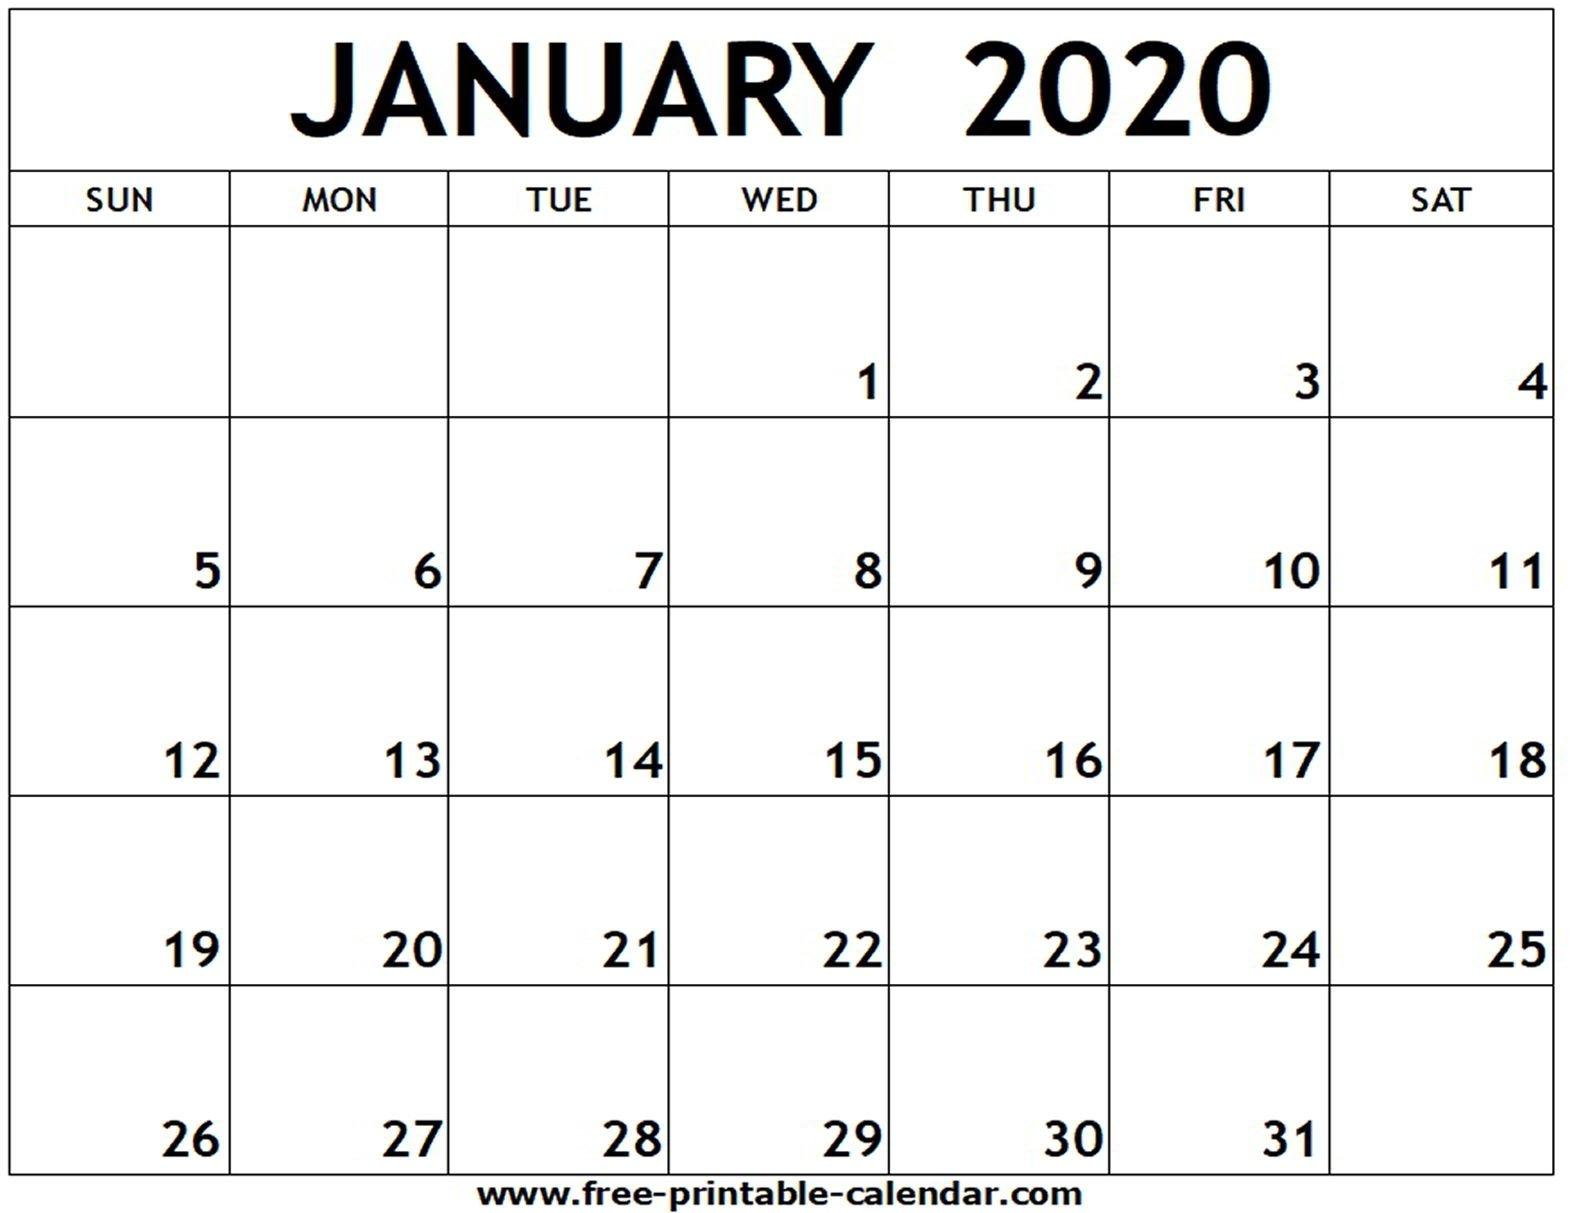 Free Printable 2020 Calendar To I Can Edit - Calendar Free Printable Calendar That I Can Edit